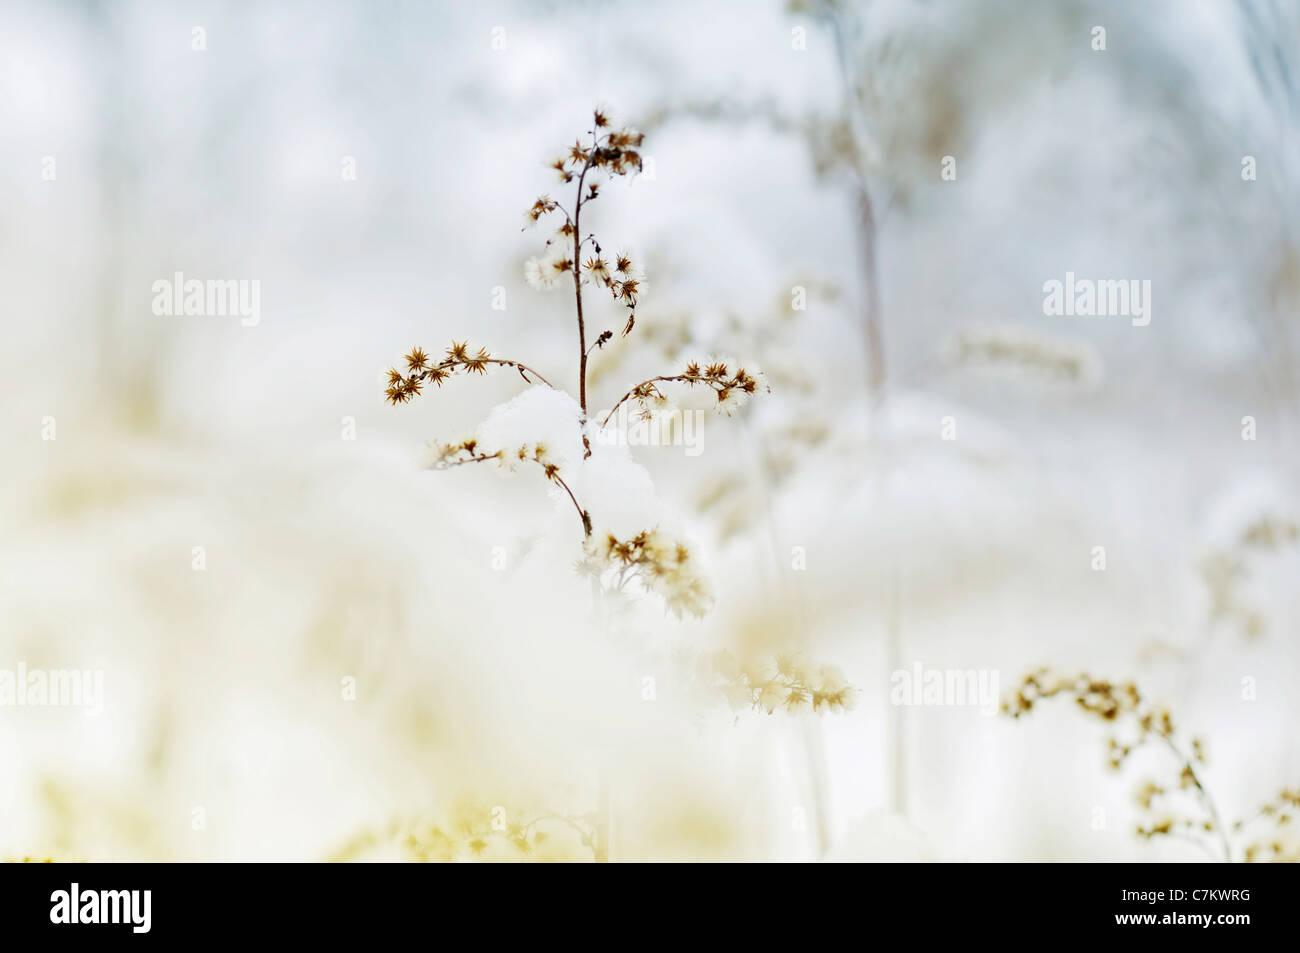 Wonderful dried flower in winter - Stock Image